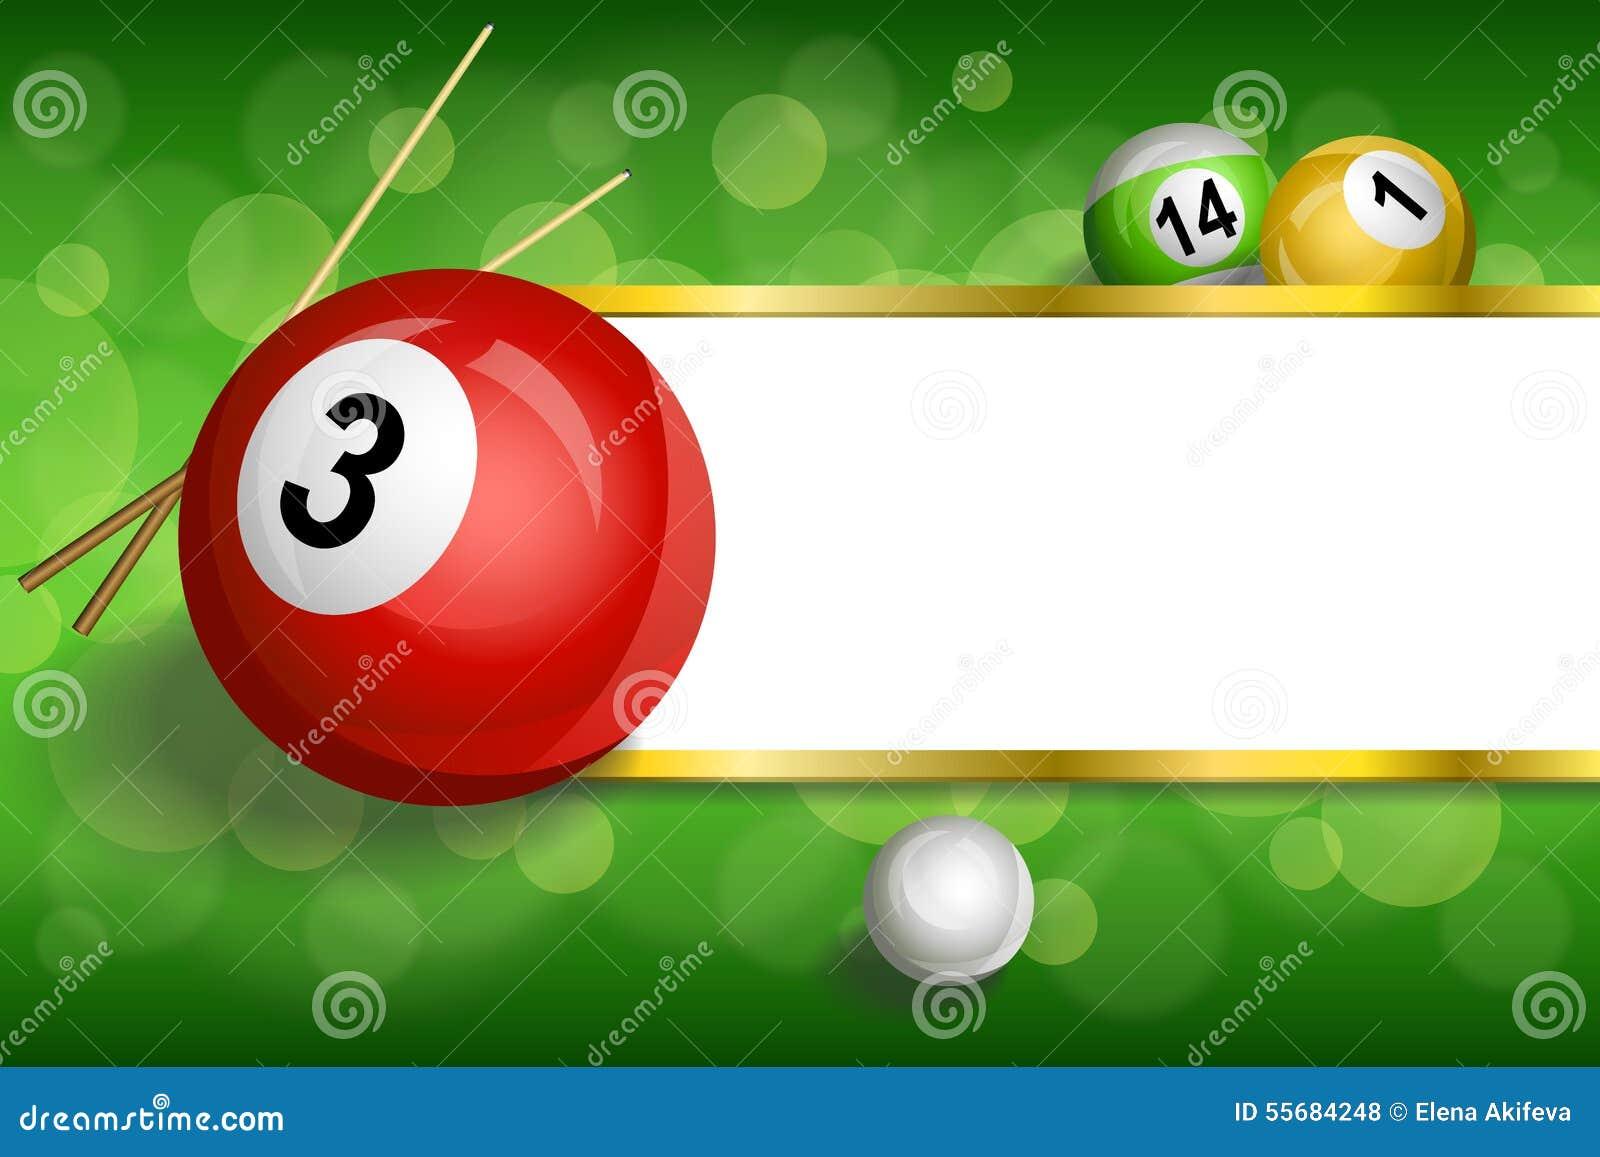 8 ball snooker